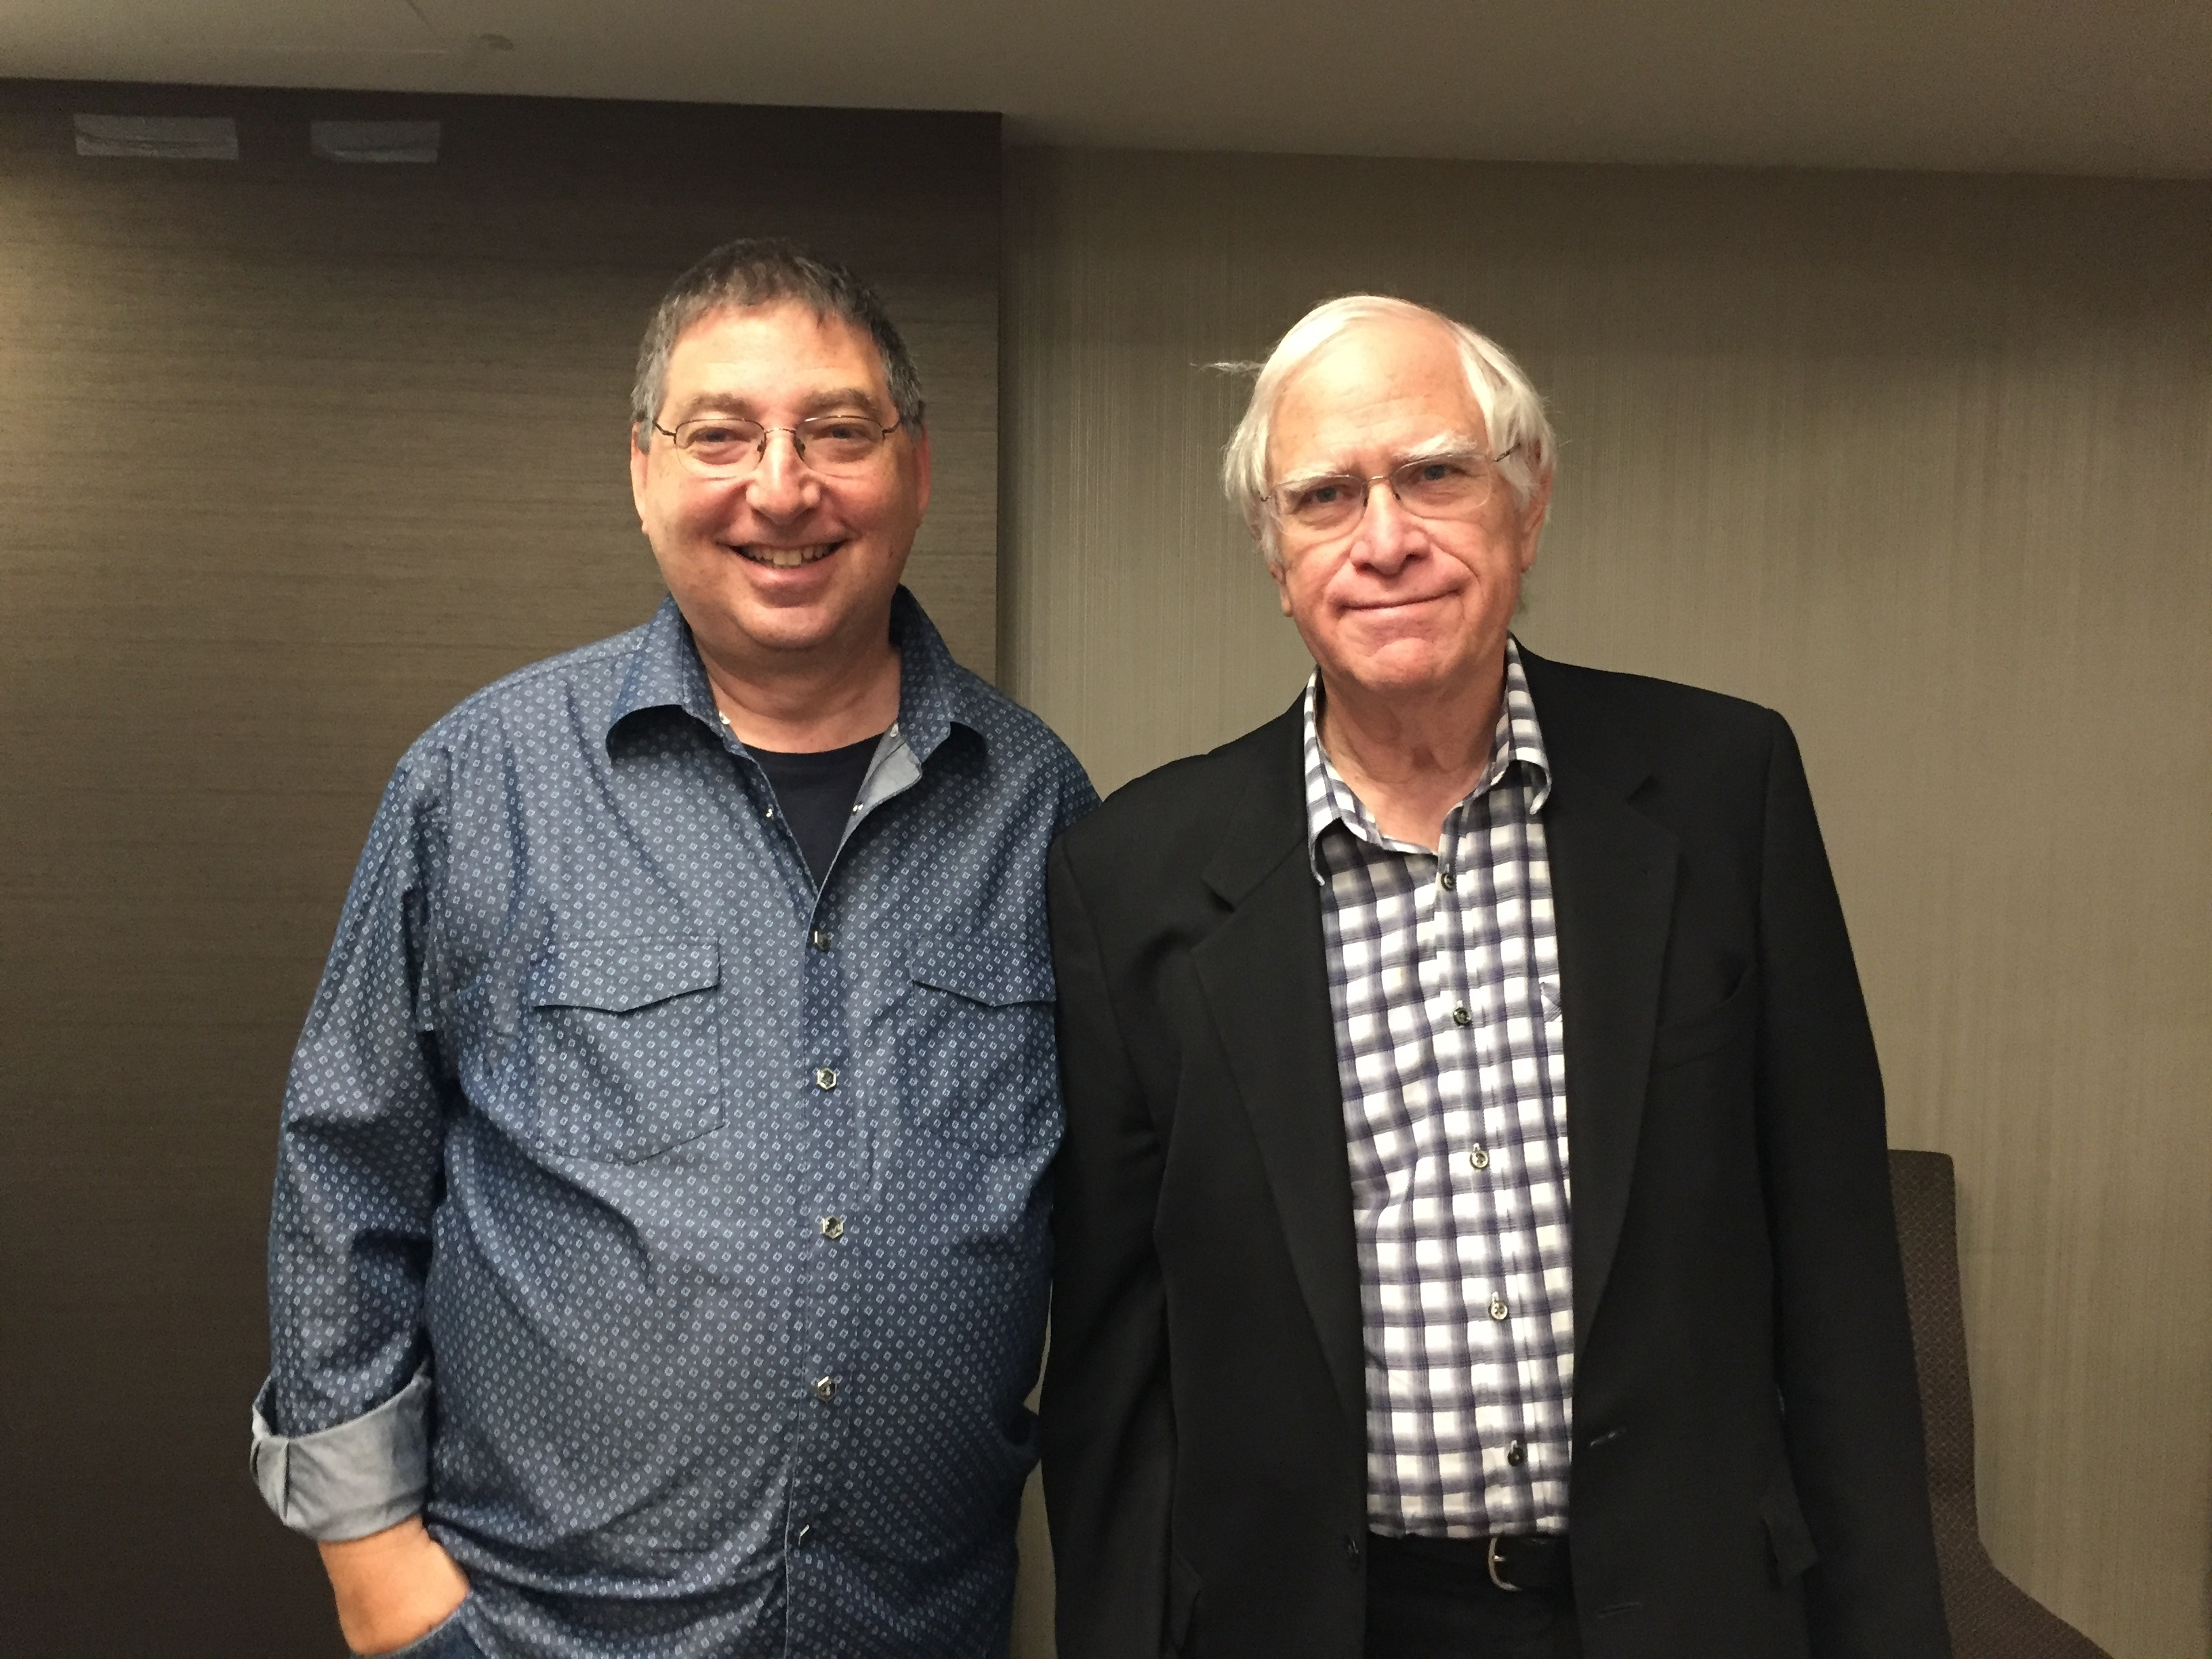 lee and novelist John Sandford at Thrillerfest 2018